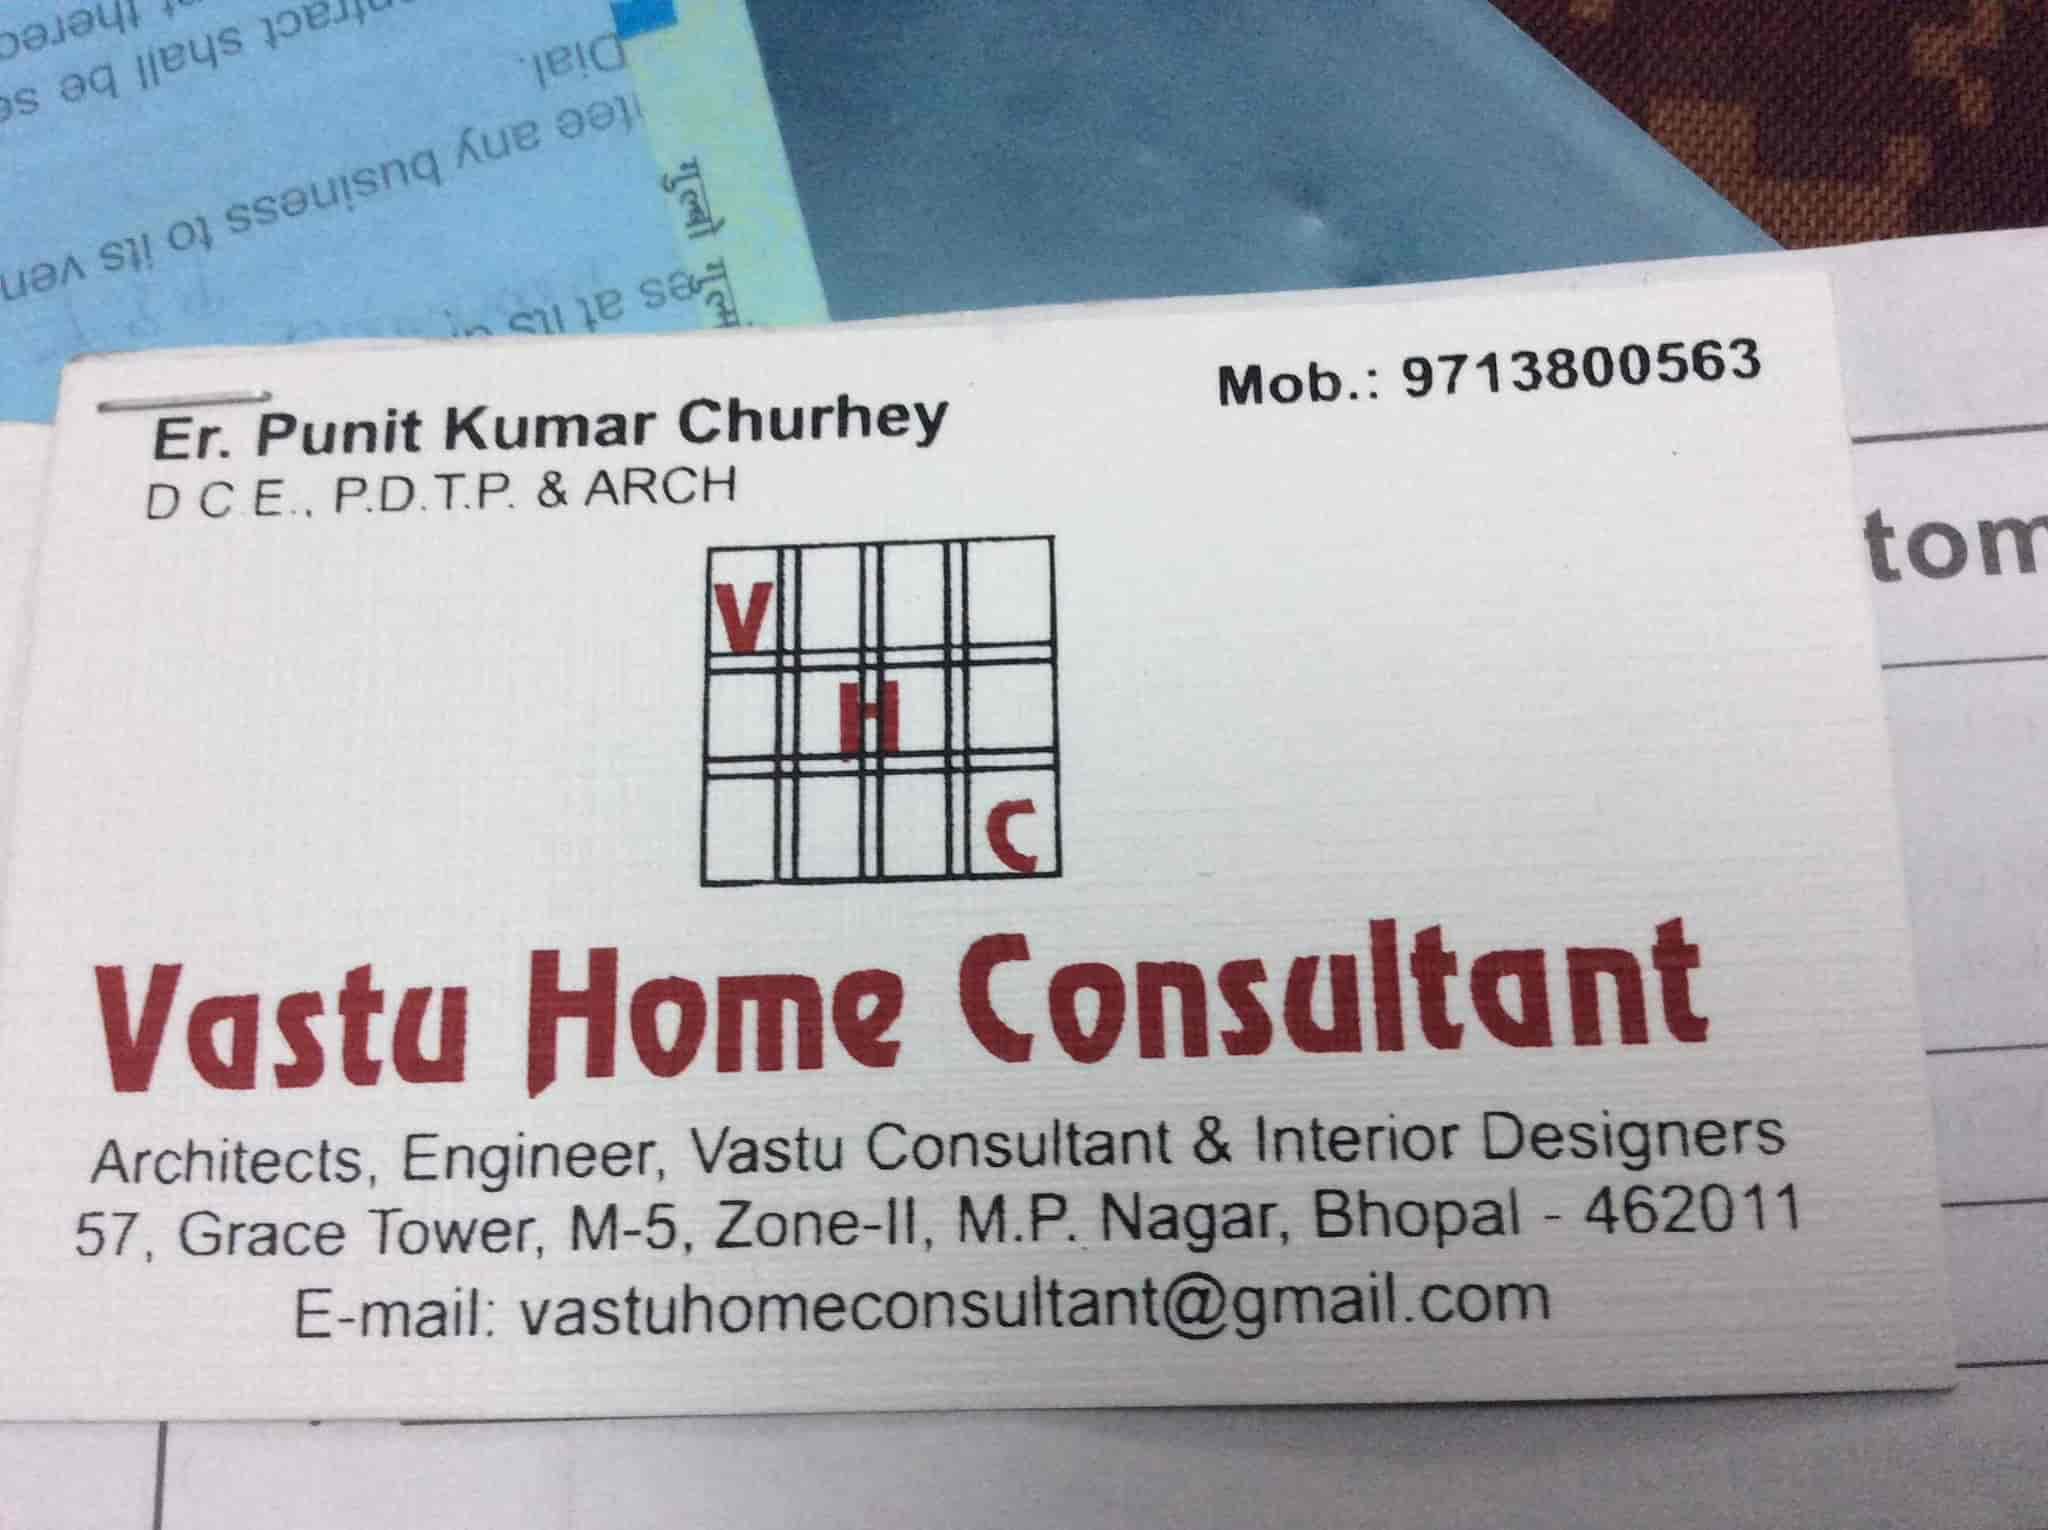 Vastu home consultant m p nagar vaastu home consultant vastu home consultant m p nagar vaastu home consultant construction companies in bhopal justdial reheart Choice Image